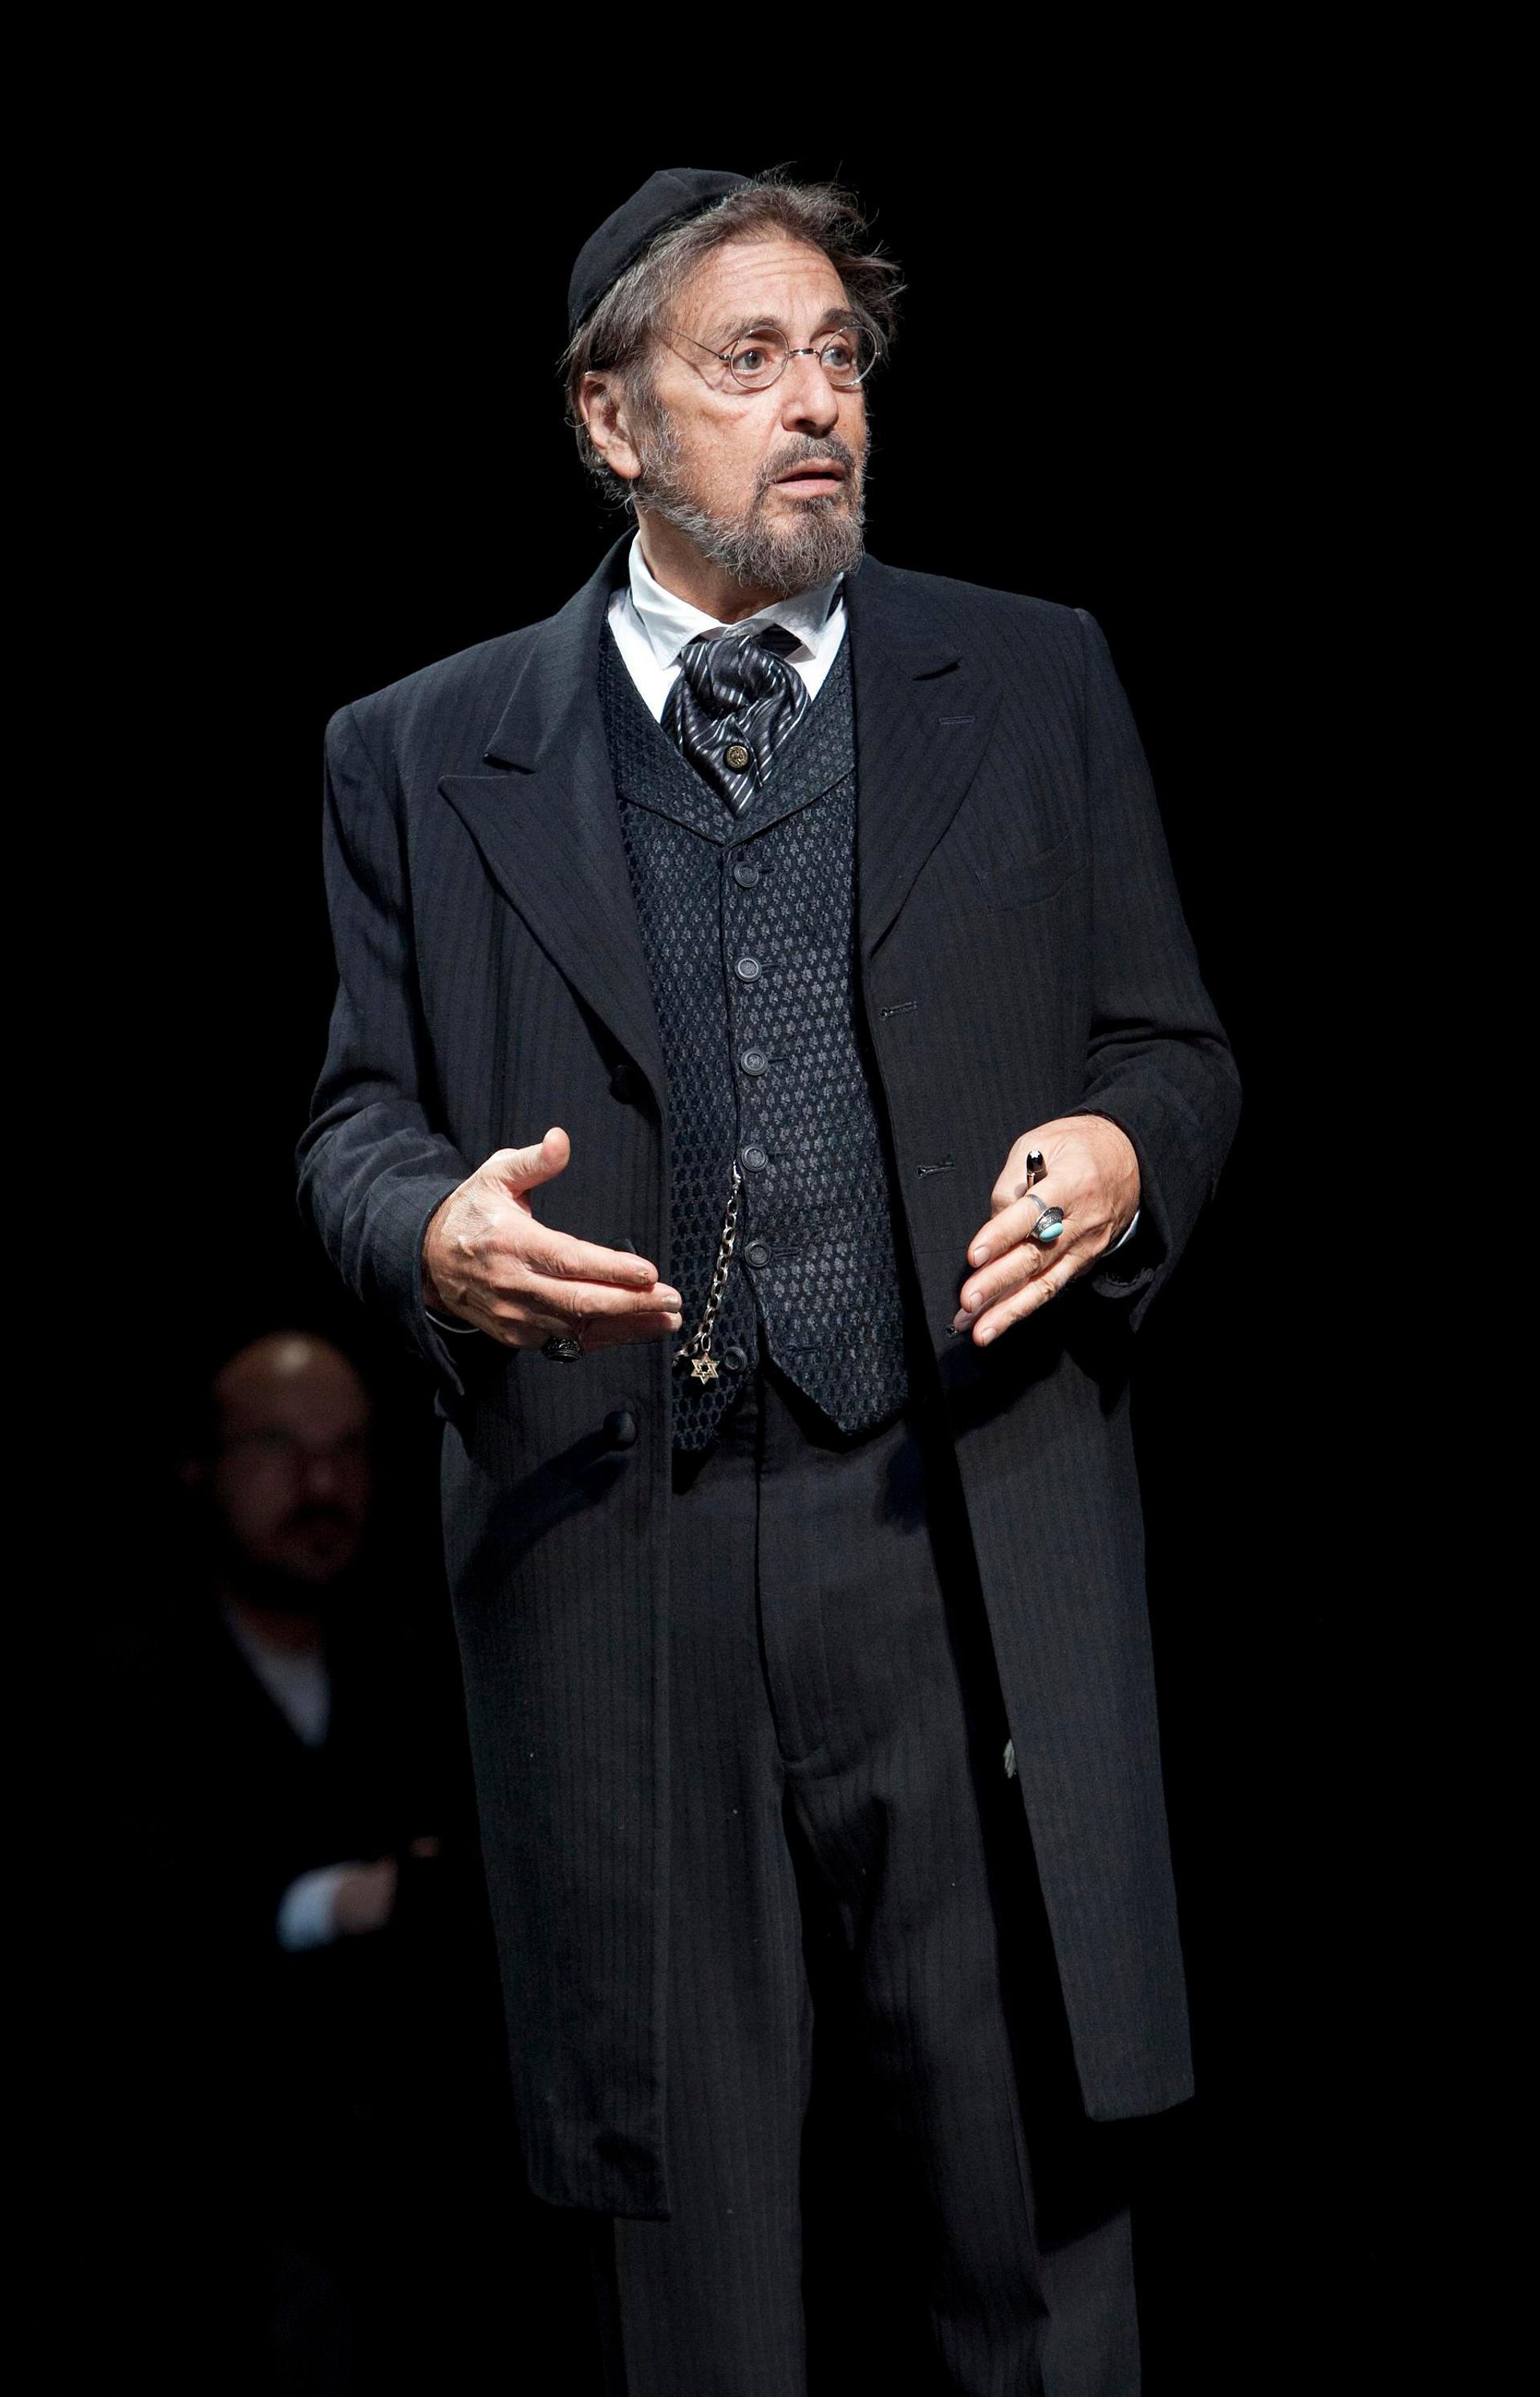 2010, The Merchant of Venice